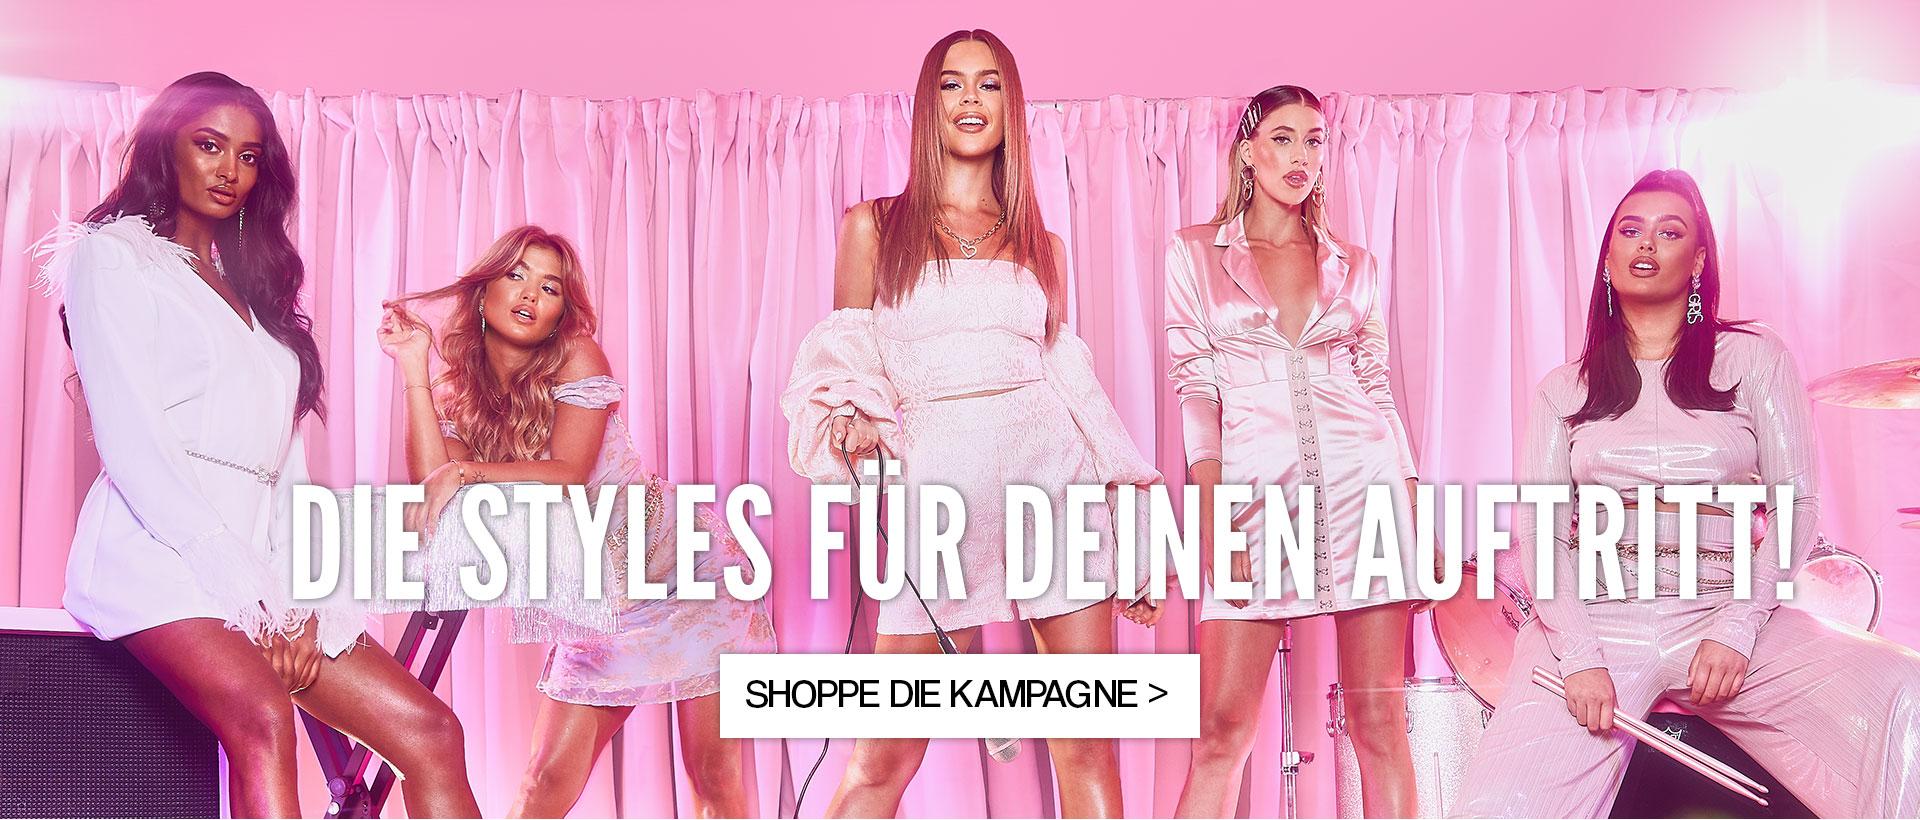 buy popular fb56d 2296b Kleidung | Damen & Herren Kleidung & Mode | Online Shoppen ...